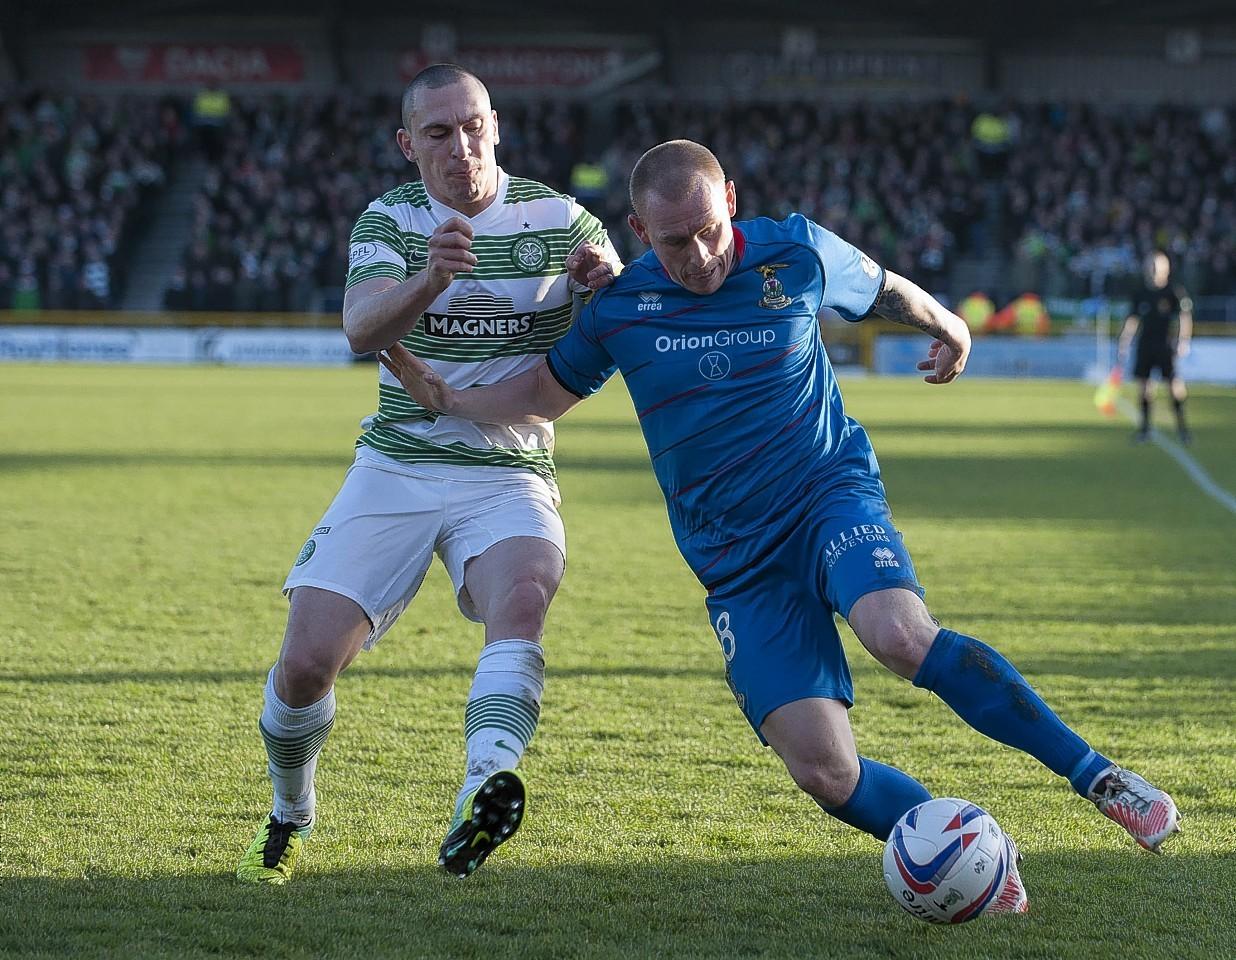 Celtic captain Scott Brown challenges Caley Thistle defender Carl Tremarco